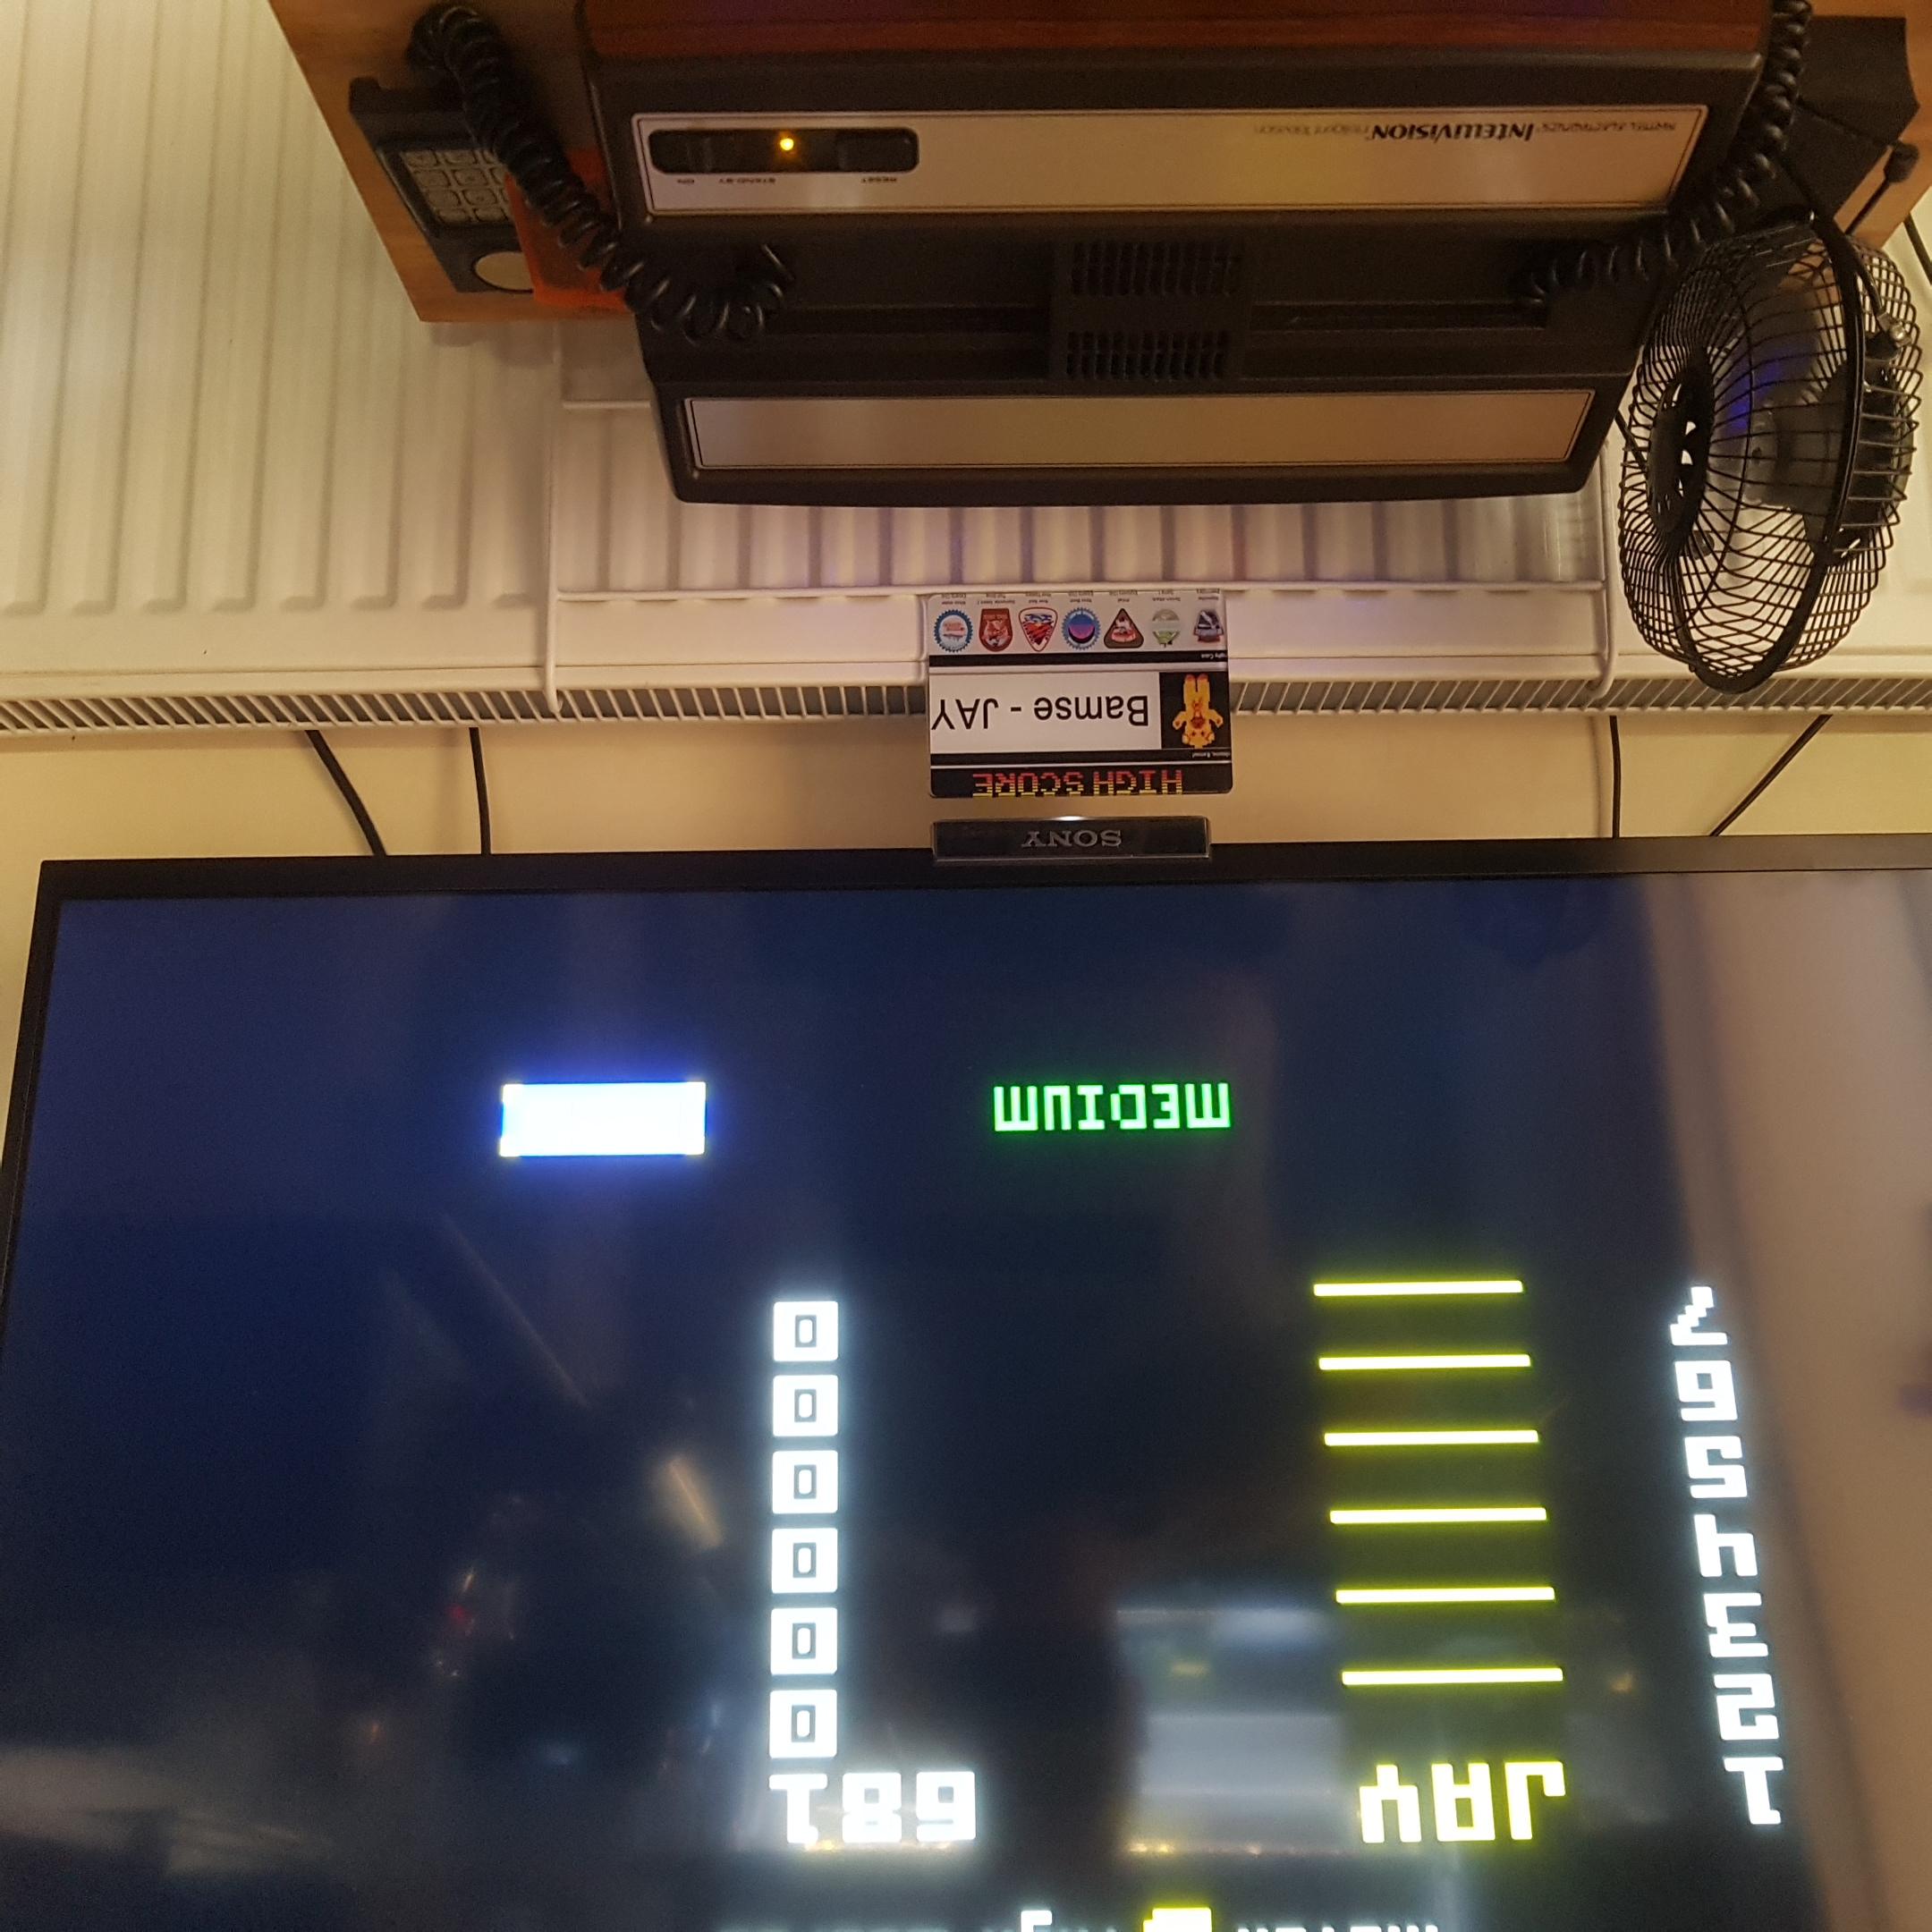 Bamse: Match 5 [Turn Mode] [Medium] (Intellivision) 681 points on 2020-04-04 13:05:23